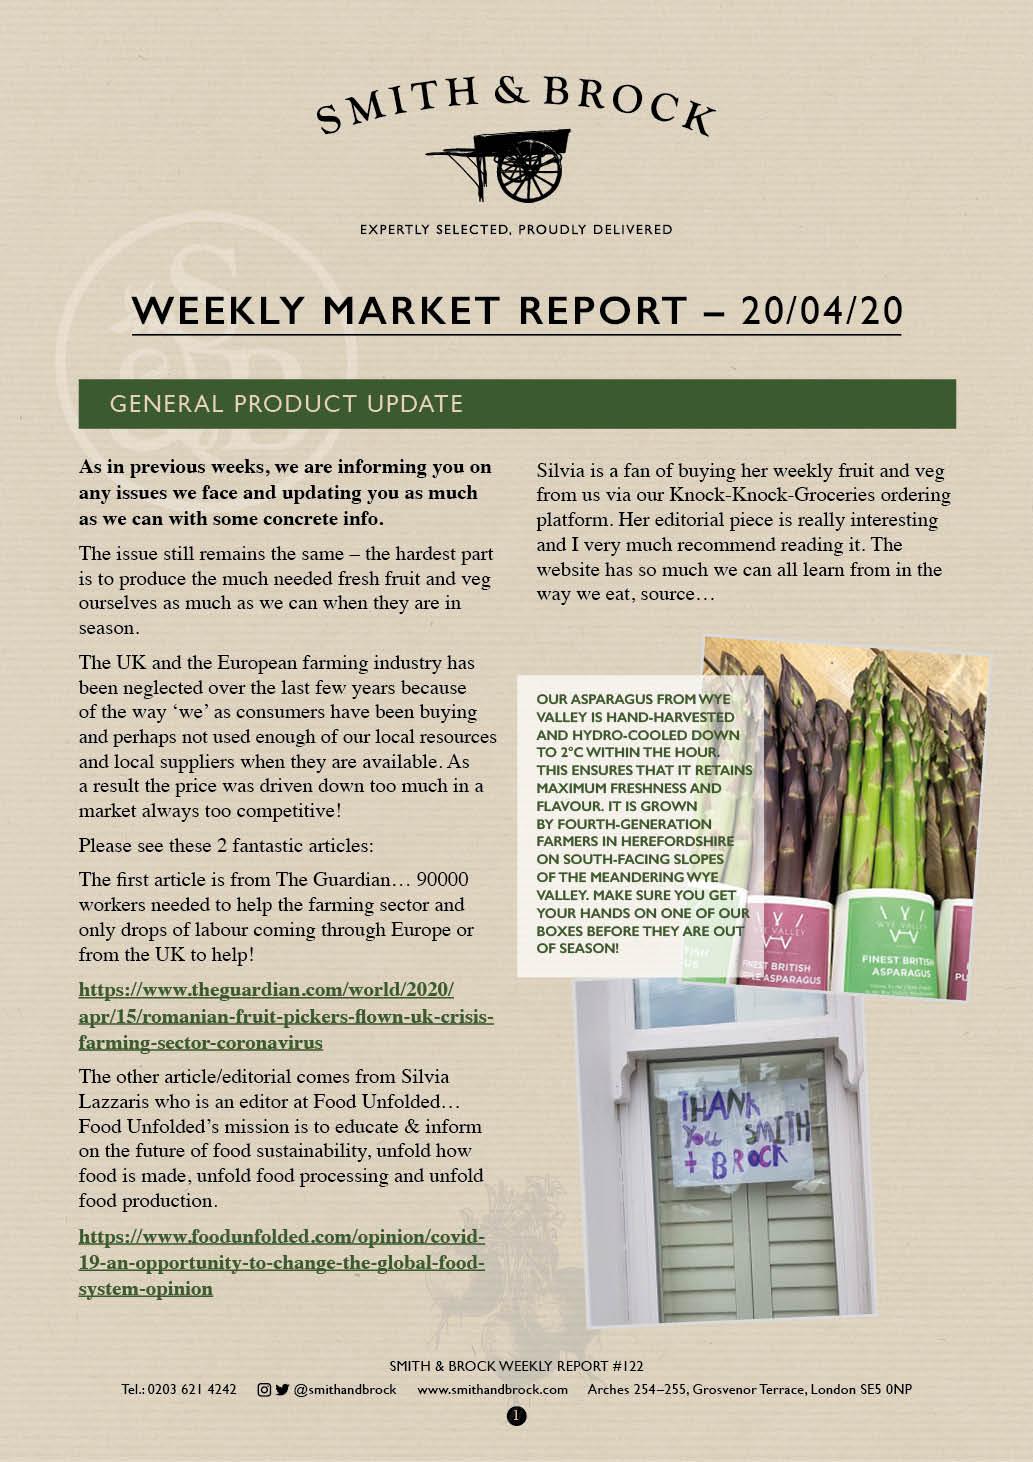 Smith&Brock Market Report 20 Apr 2020 122